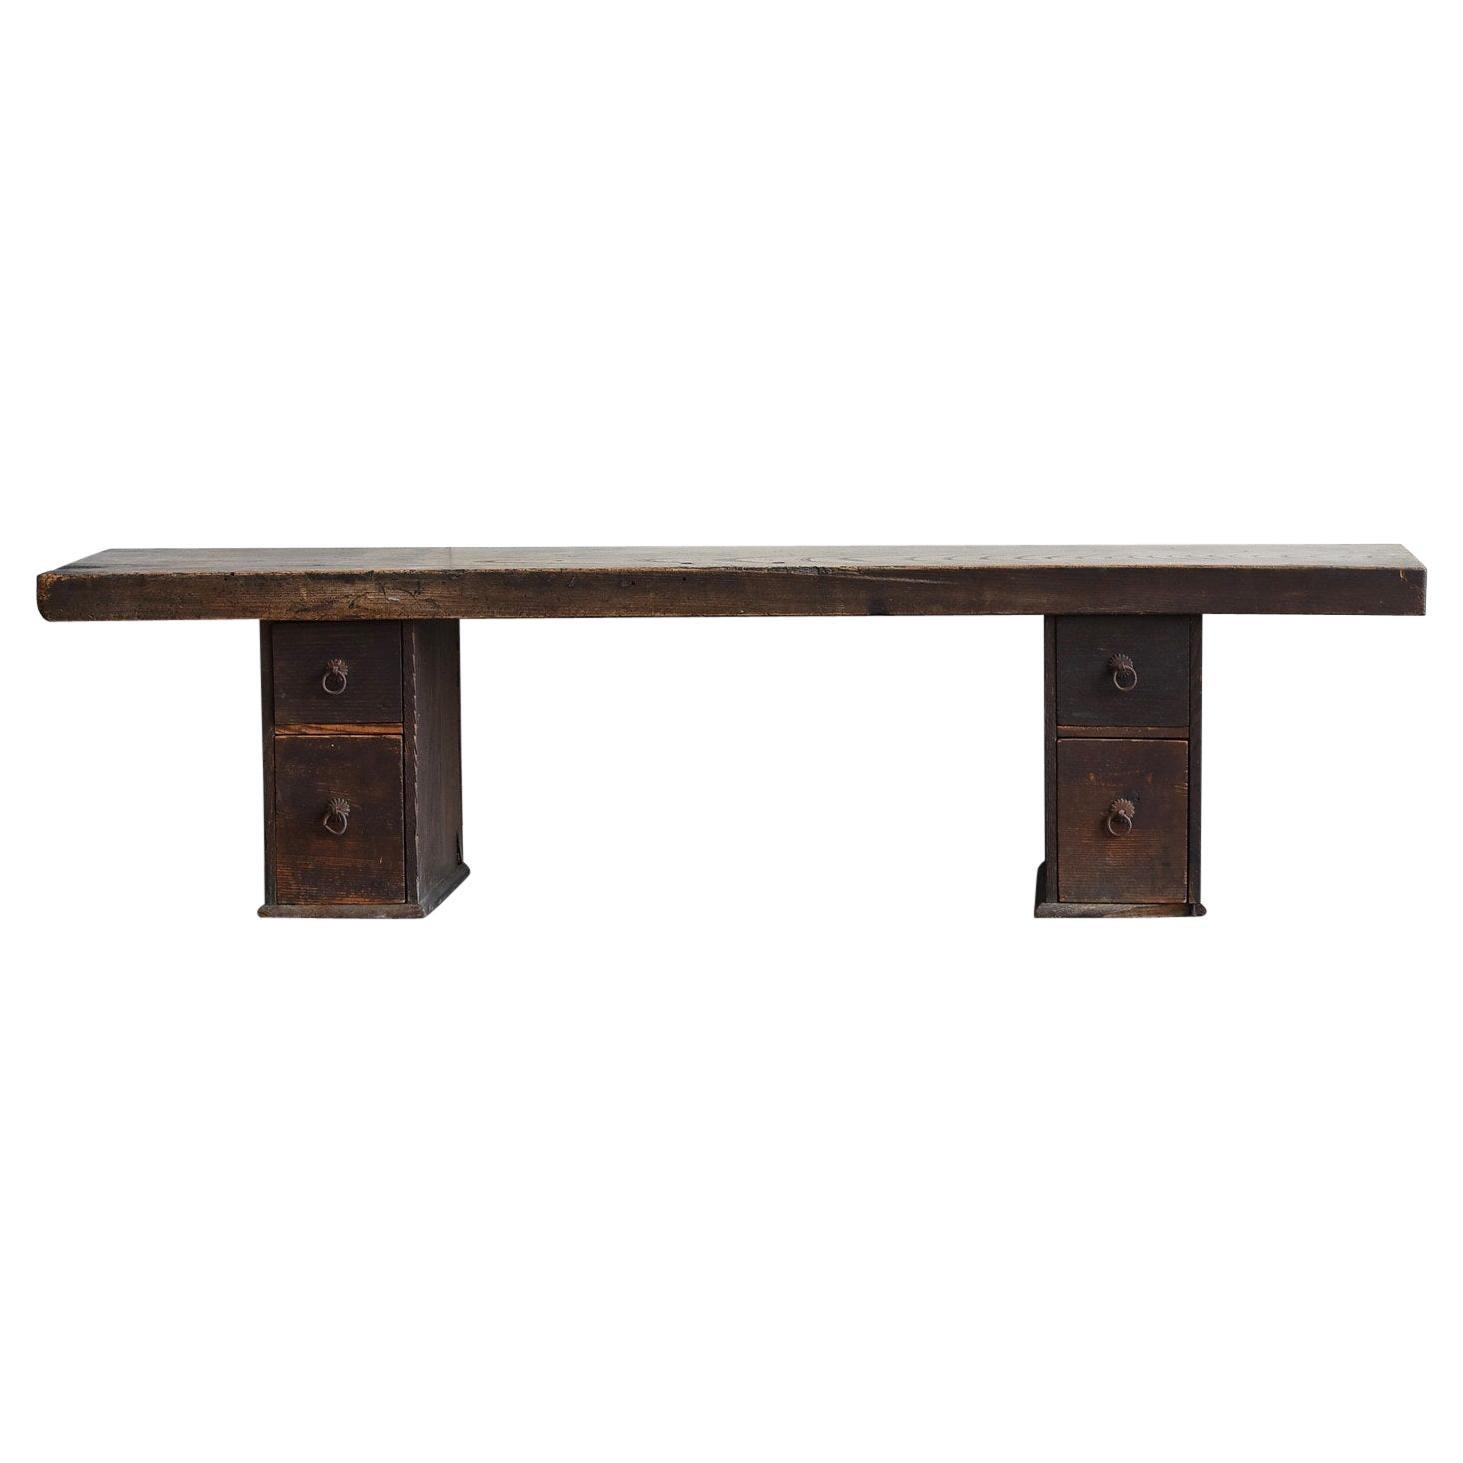 Taisho Era-Early Showa Era Japanese Antique Craftsman's Work Table /Coffee Table